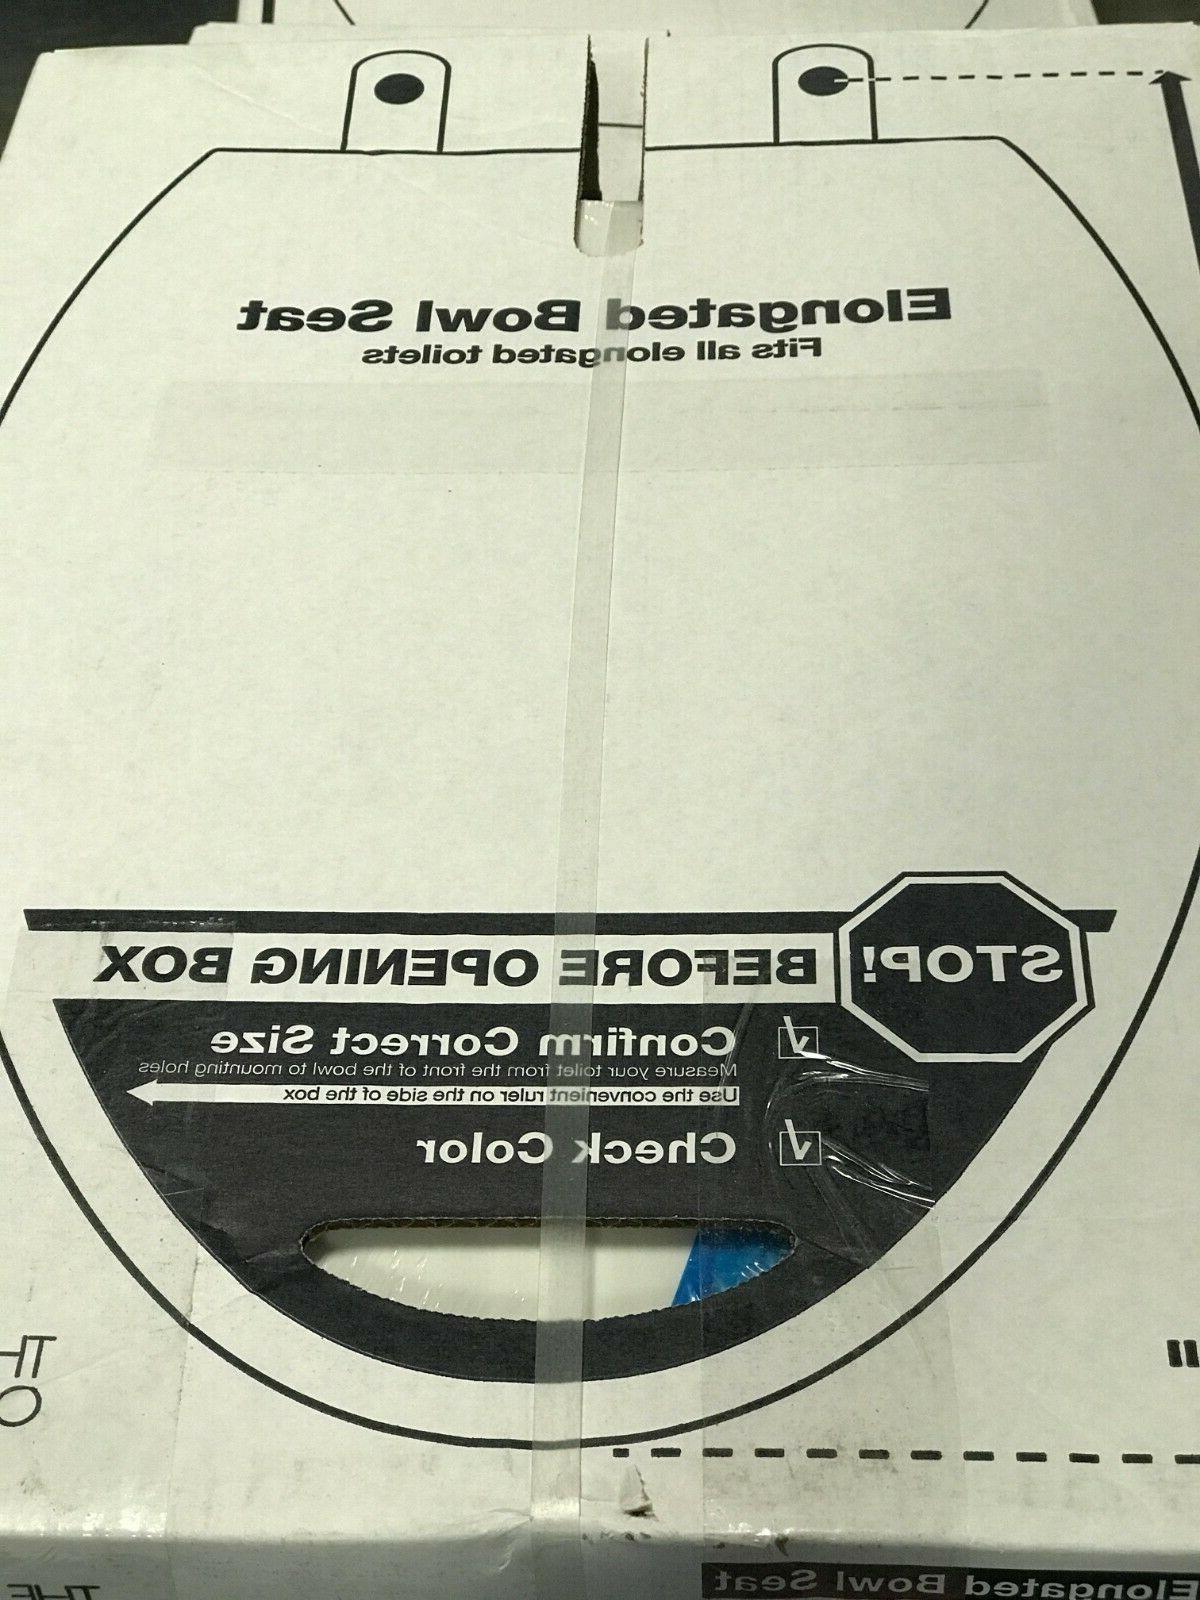 kohler elongated toilet bowl seat 20110 0